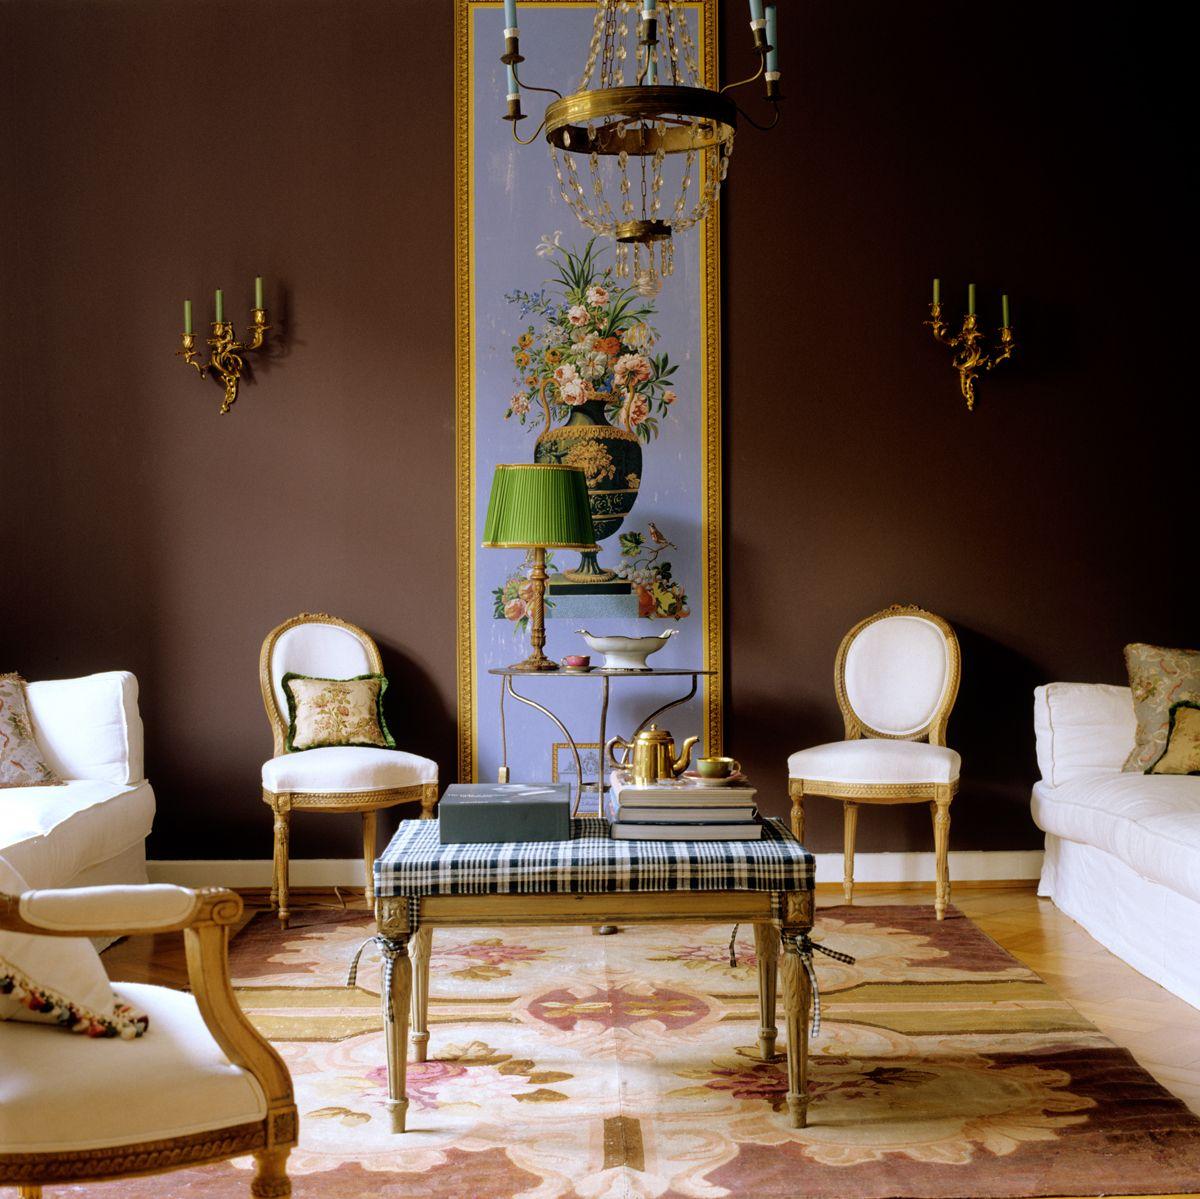 French Swedish German Living Room Inspiration Living Room Decor Pinterest Living